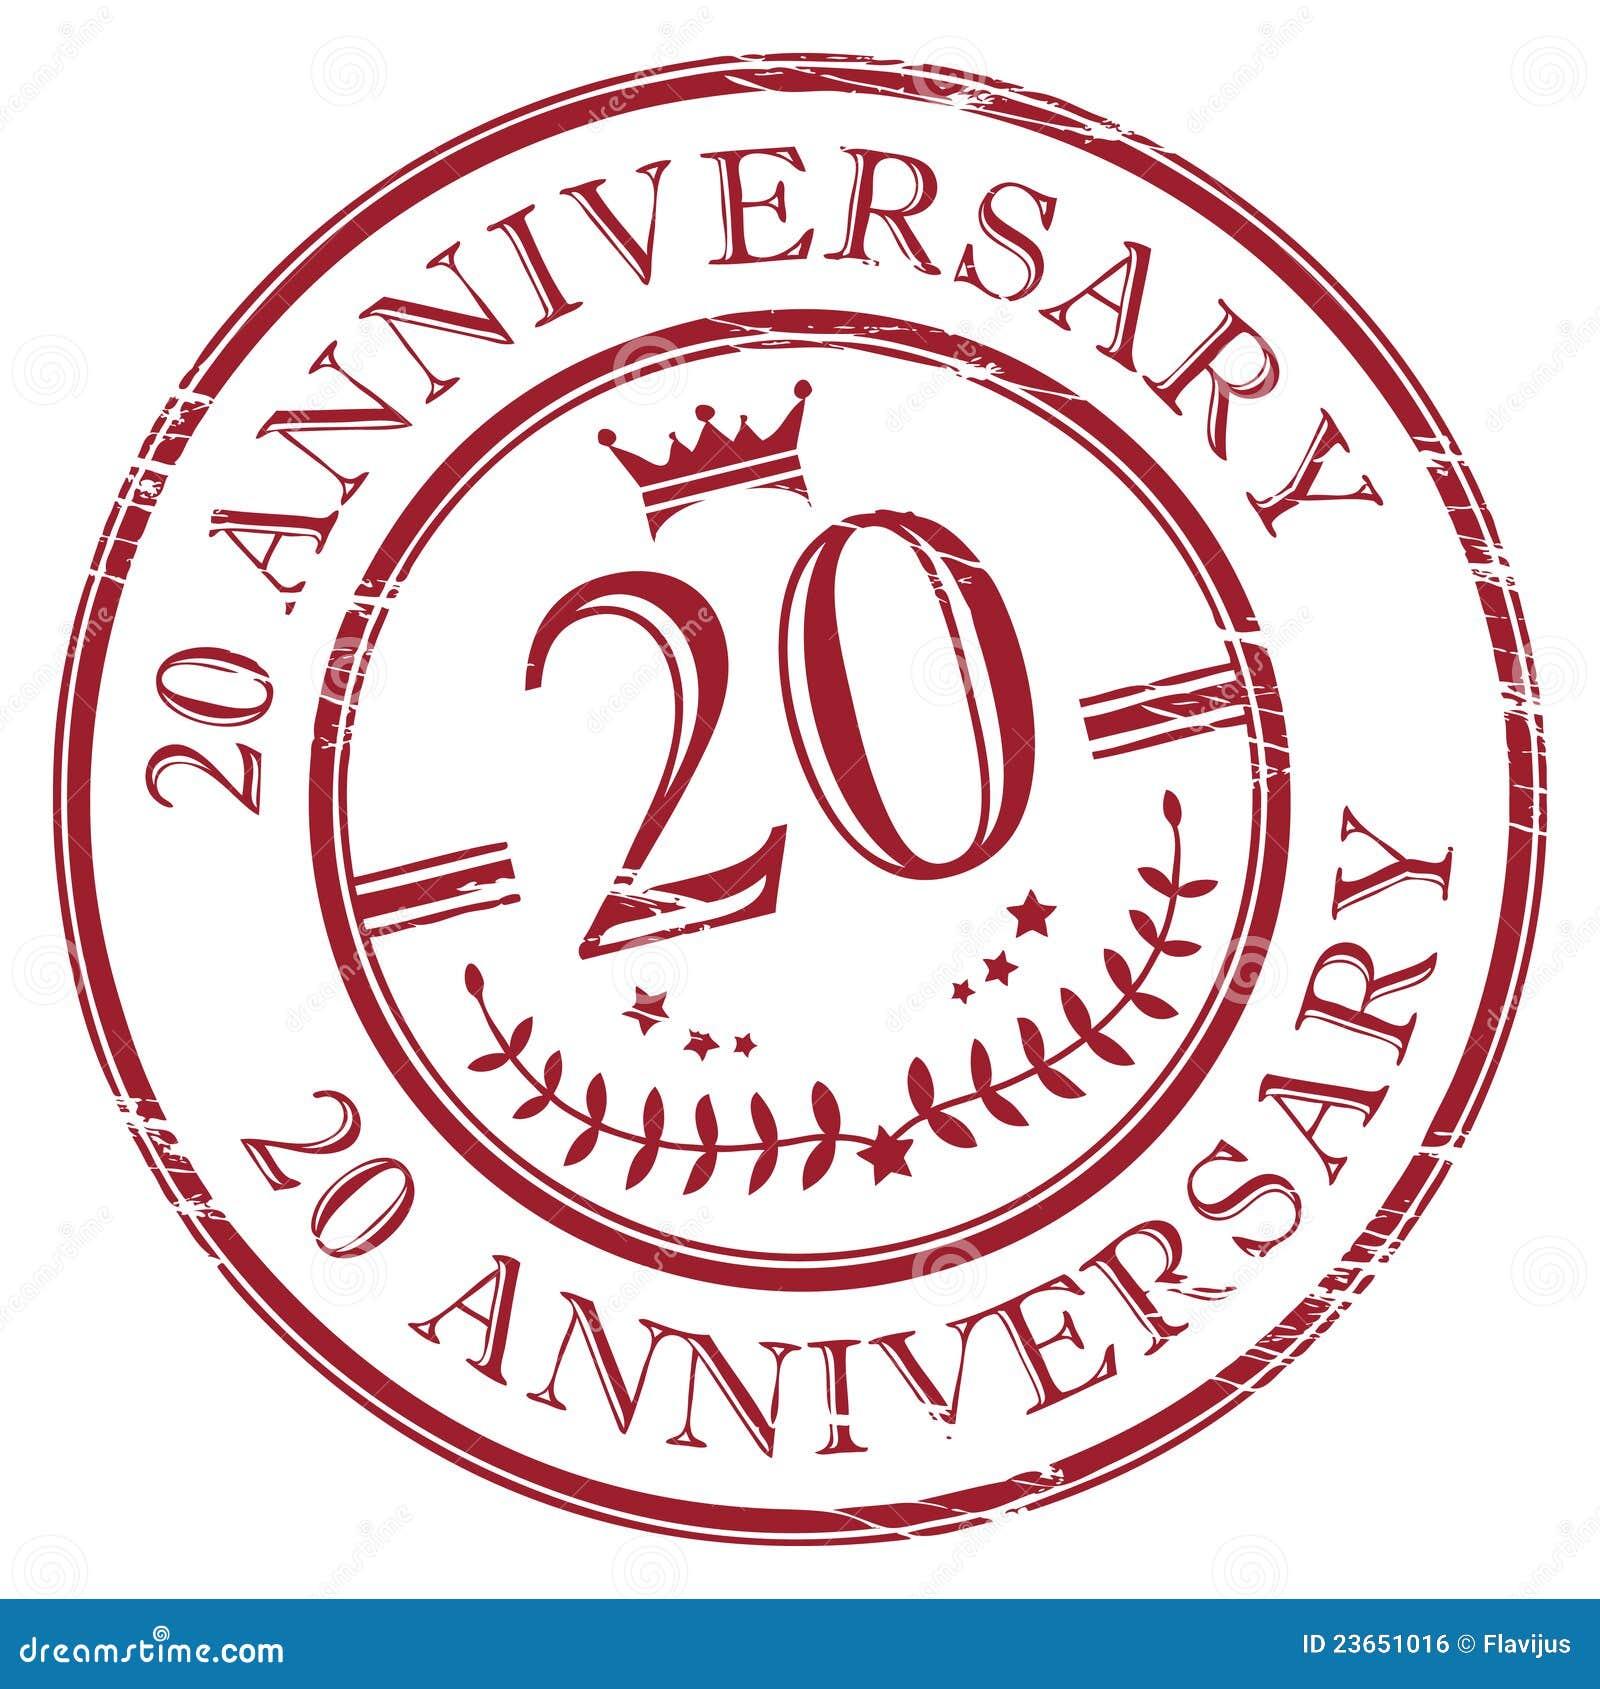 20 Anniversary Royalty Free Stock Image - Image: 23651016